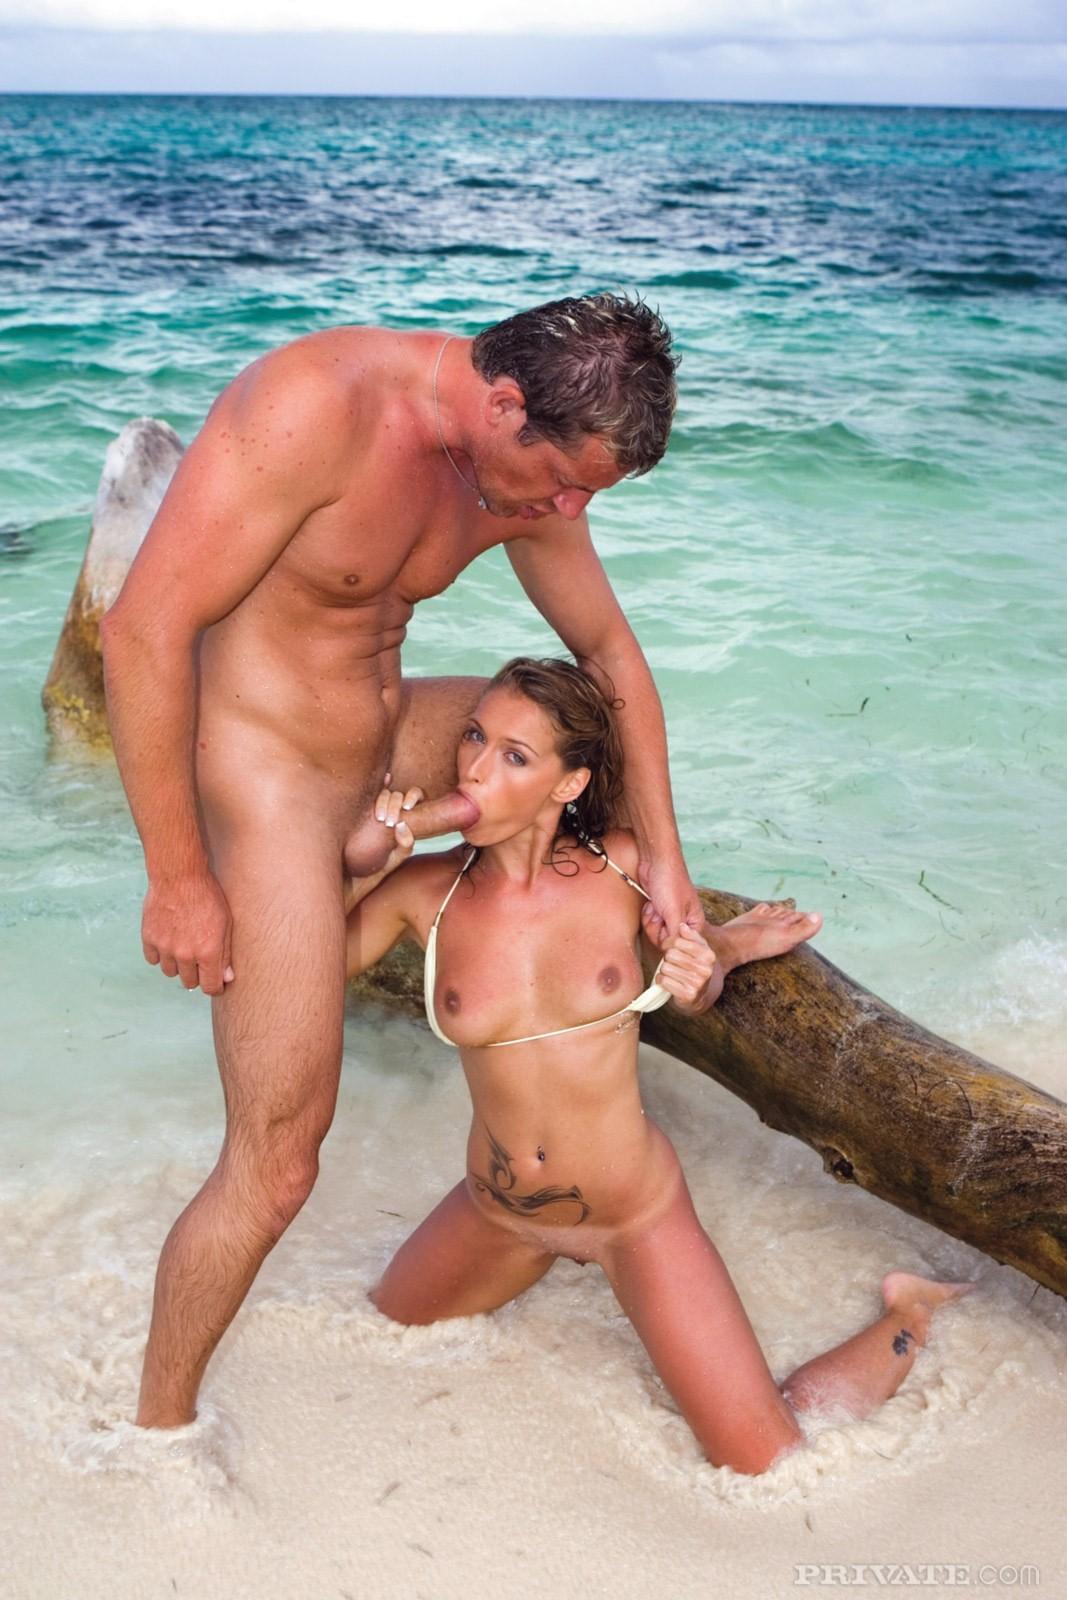 anal large dildo woman – Anal